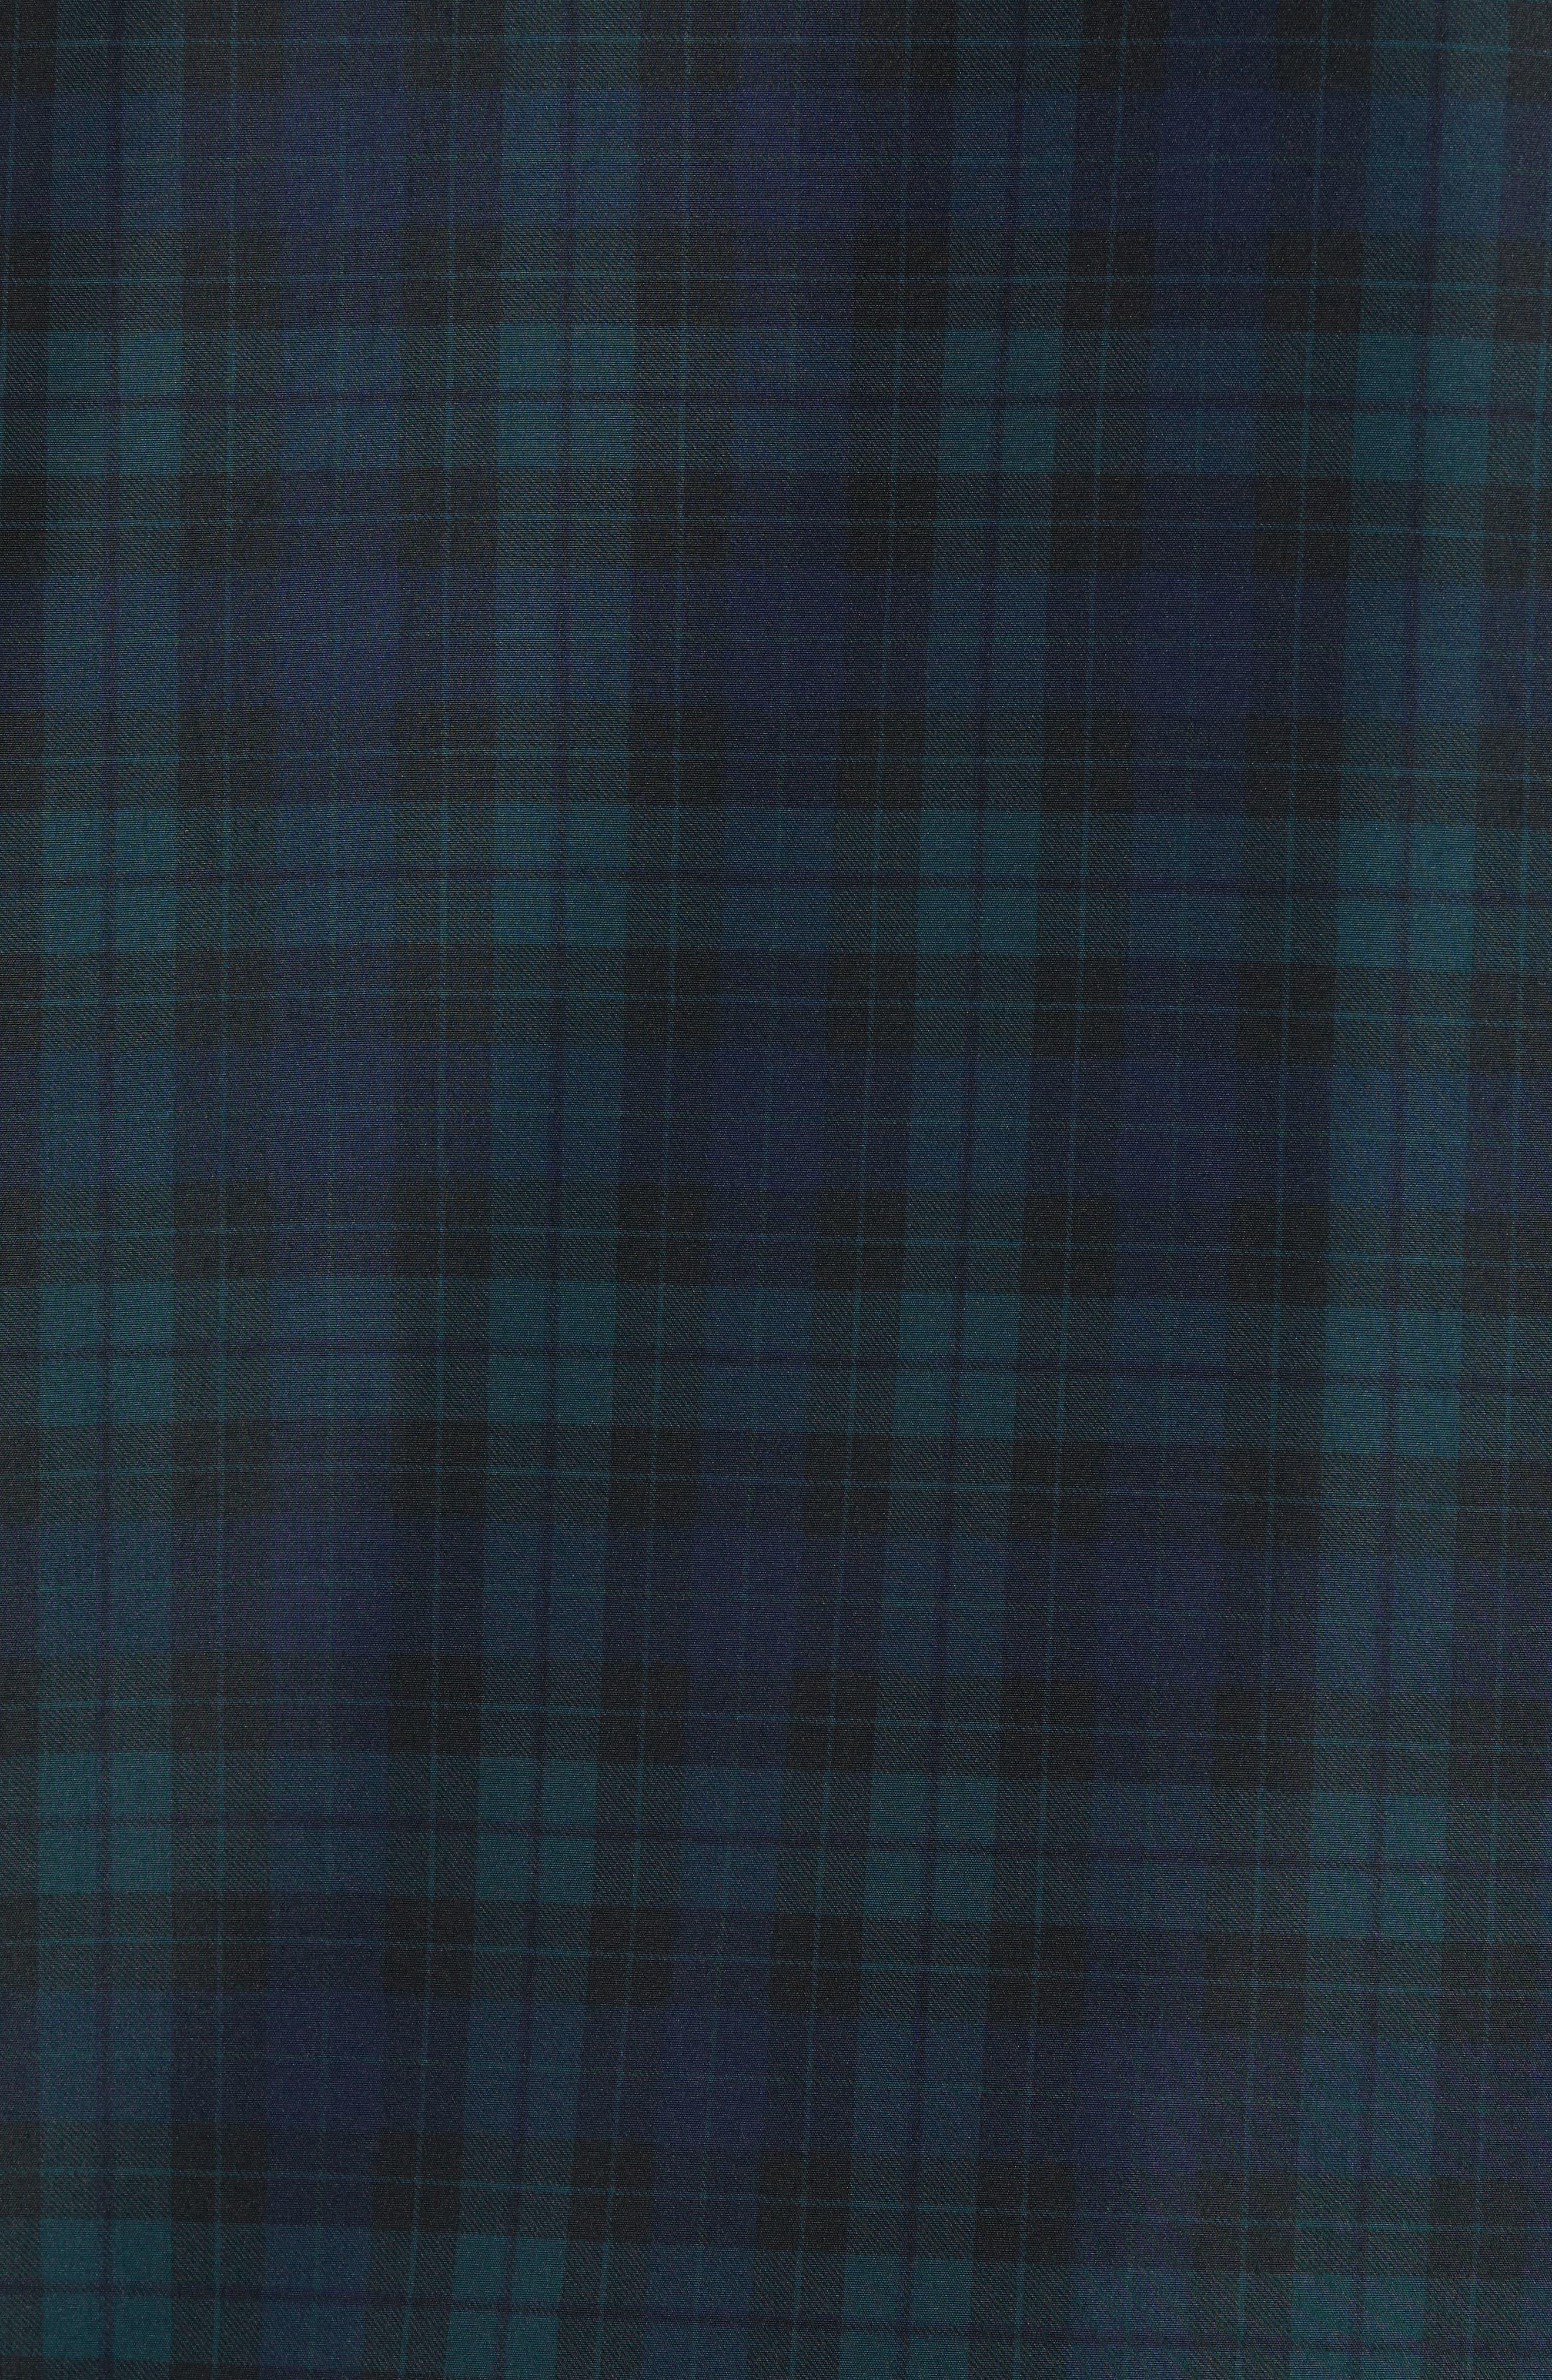 Regular Fit Check Windbreaker Jacket,                             Alternate thumbnail 7, color,                             NAVY BLUE/ SINOPLE BLACK